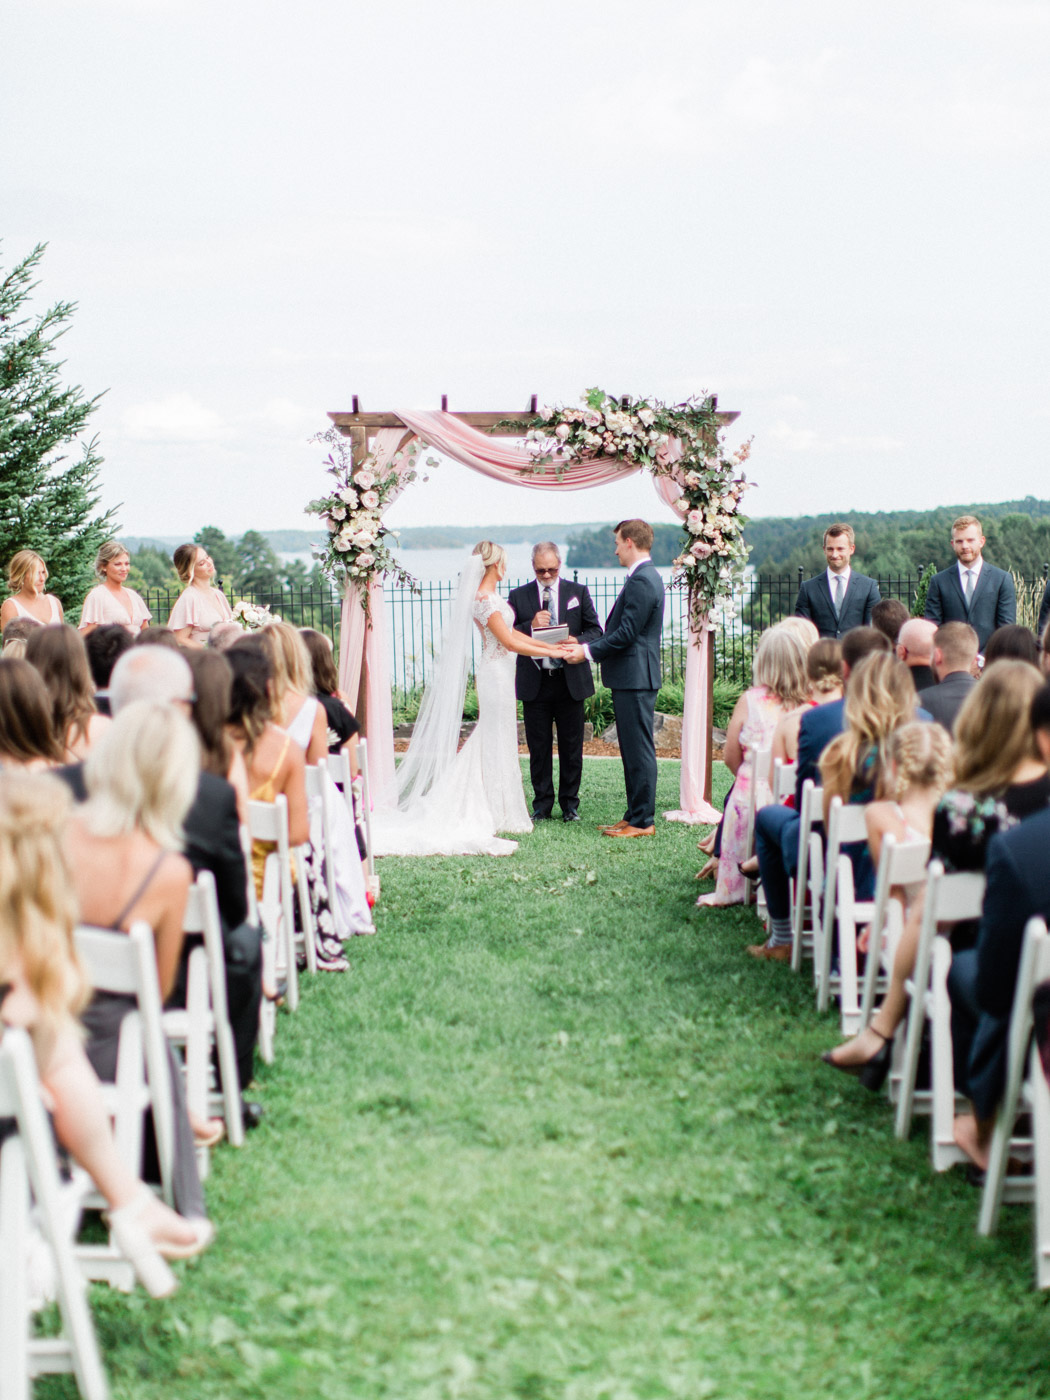 Toronto-Muskoka-wedding-photographer-summery-fun-documentary-the-marriott-rosseau82.jpg